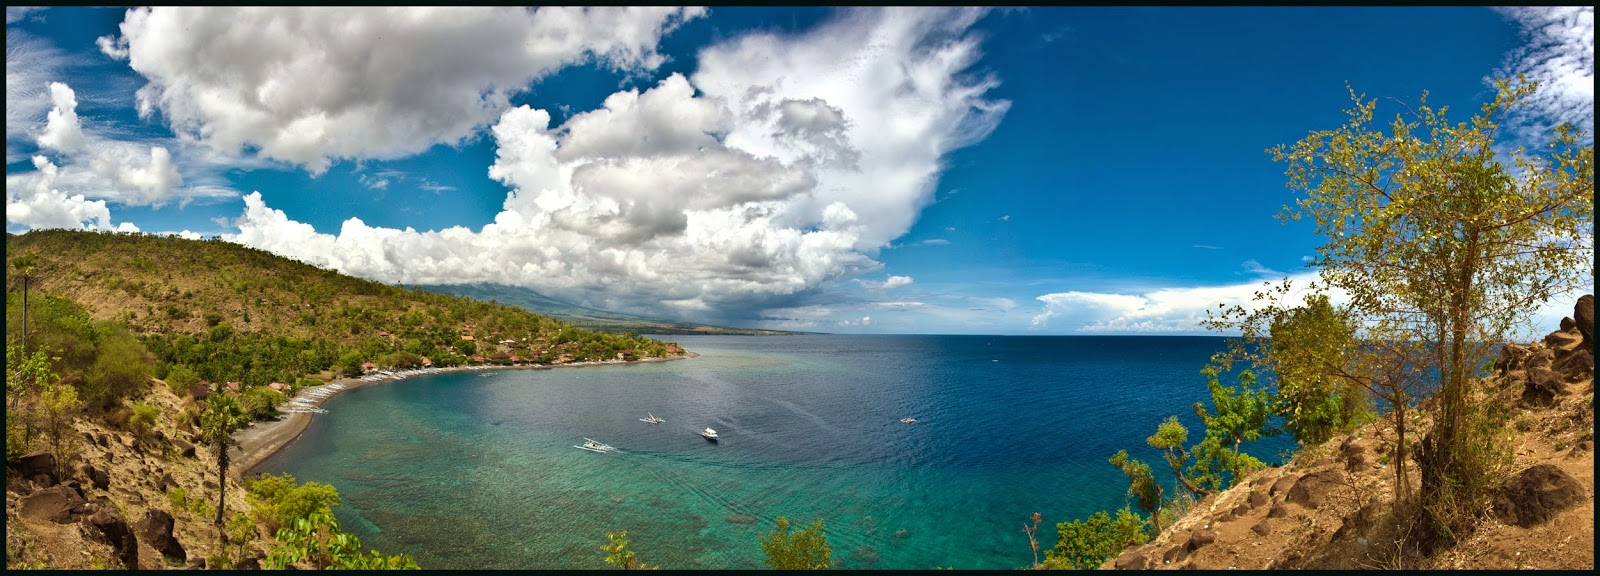 Bali Media Info Pesona Pantai Amed Karangasem Hobi Diving Menyelam